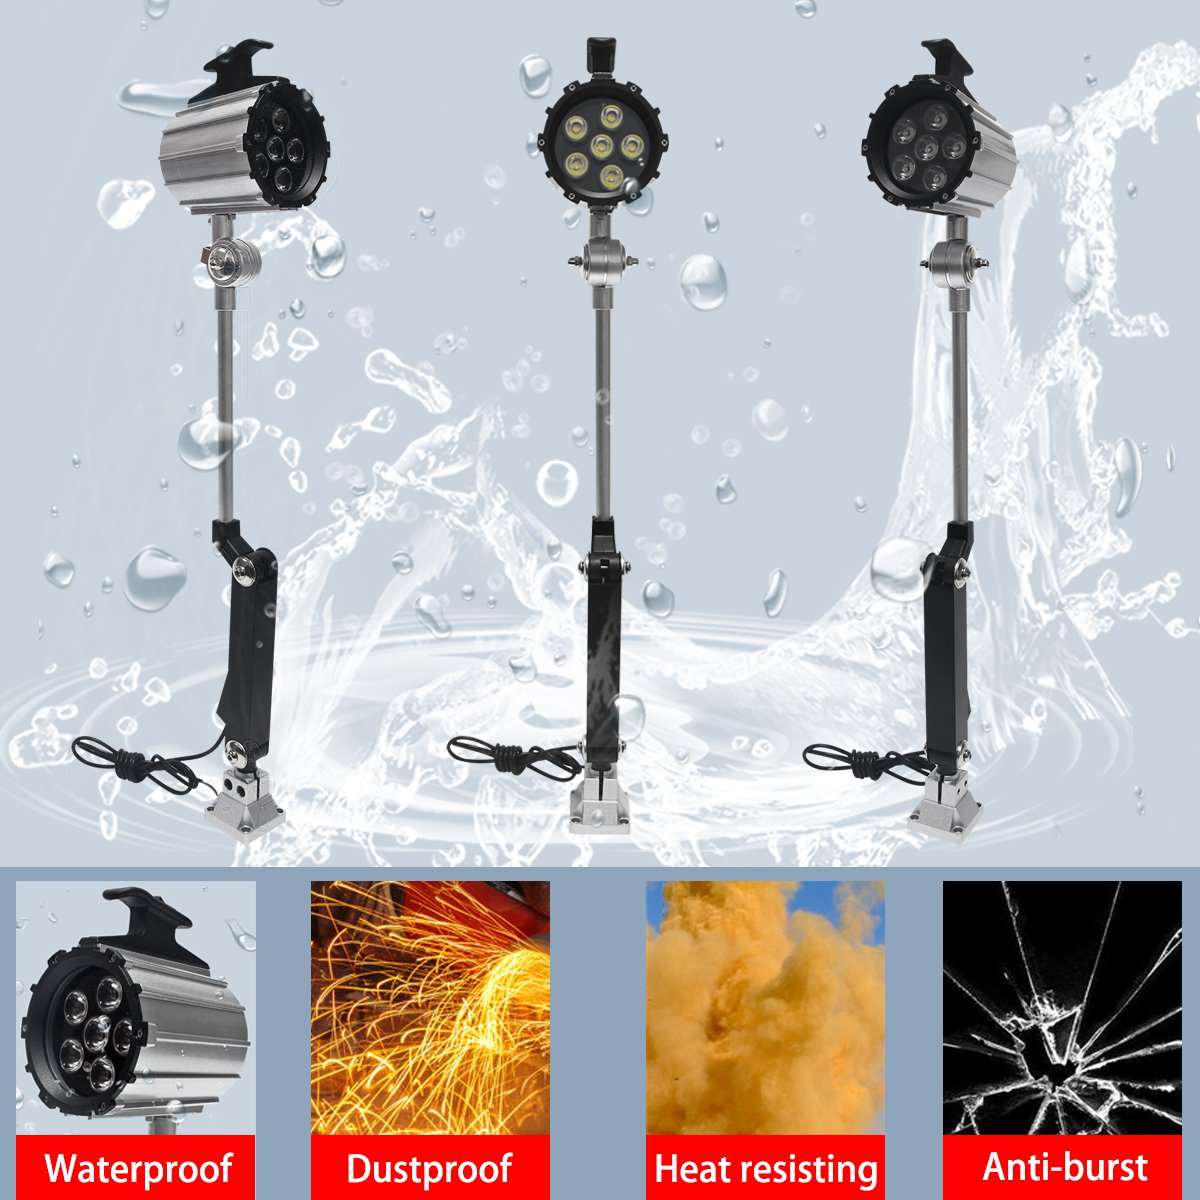 Wisamic LED Work Light for Lathe, CNC Milling Machine, Drilling Machine, Aluminum Alloy, 12W 110V-220V, Adjustable Multipurpose Worklight, Long Arm by WISAMIC (Image #6)